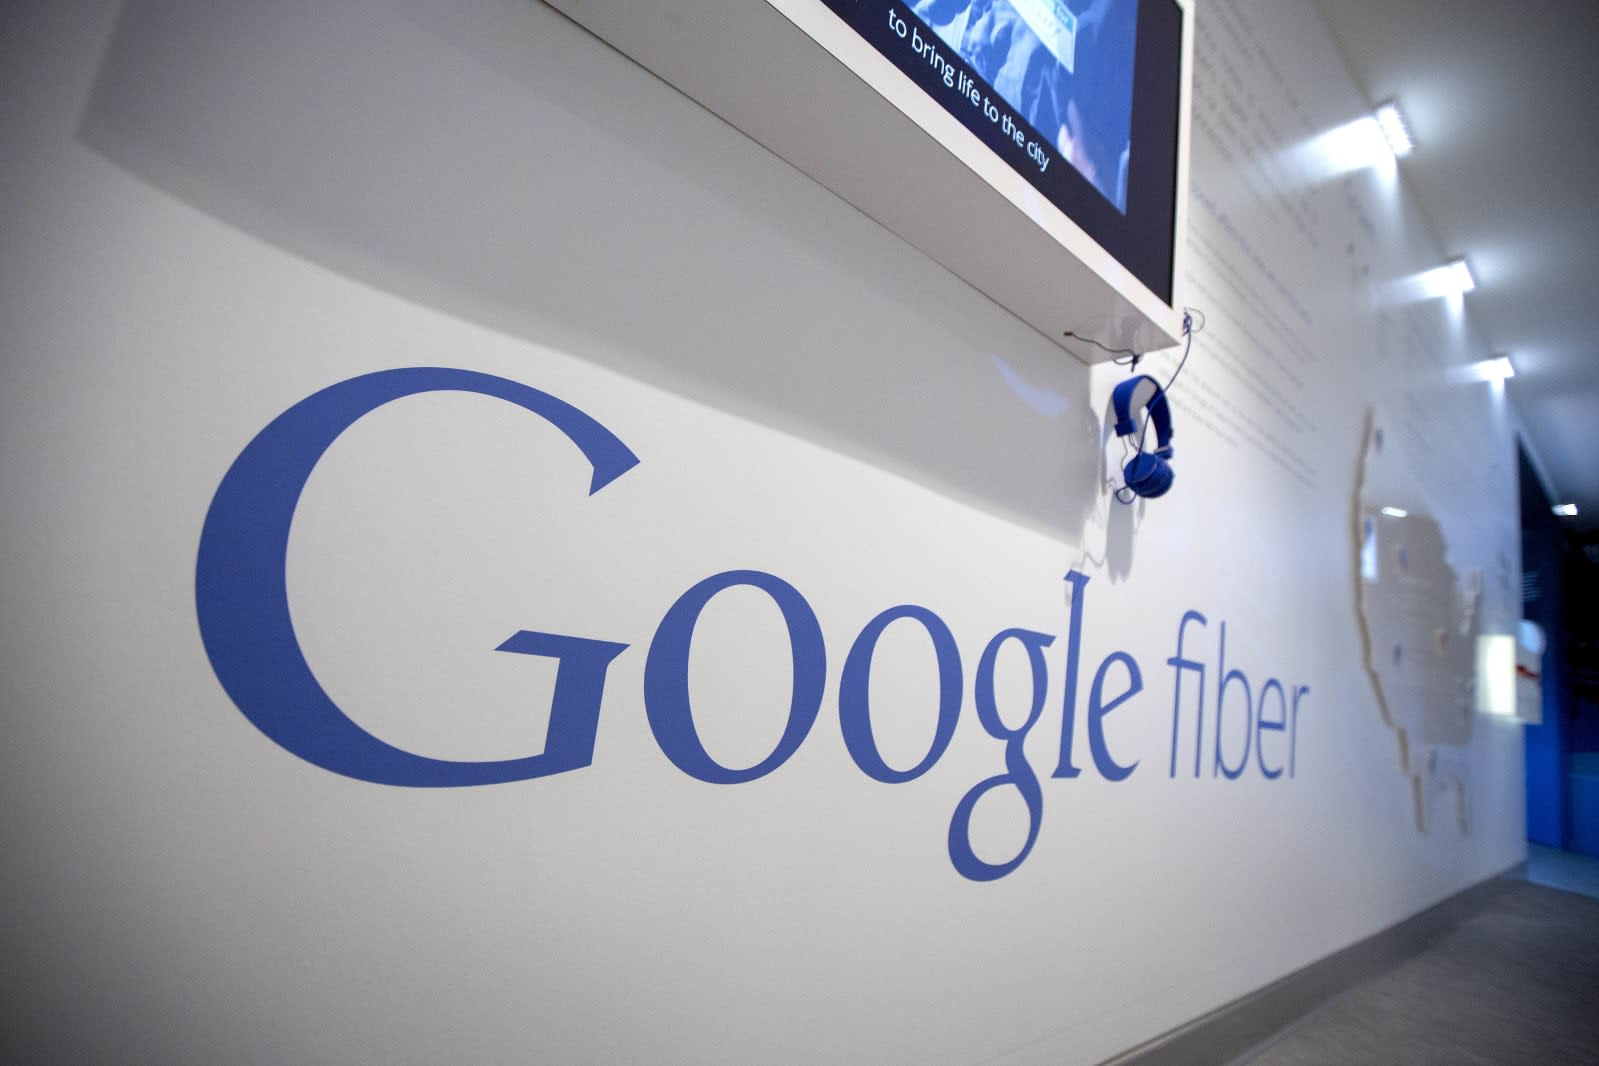 Google Fiber won't offer TV in San Antonio and Louisville